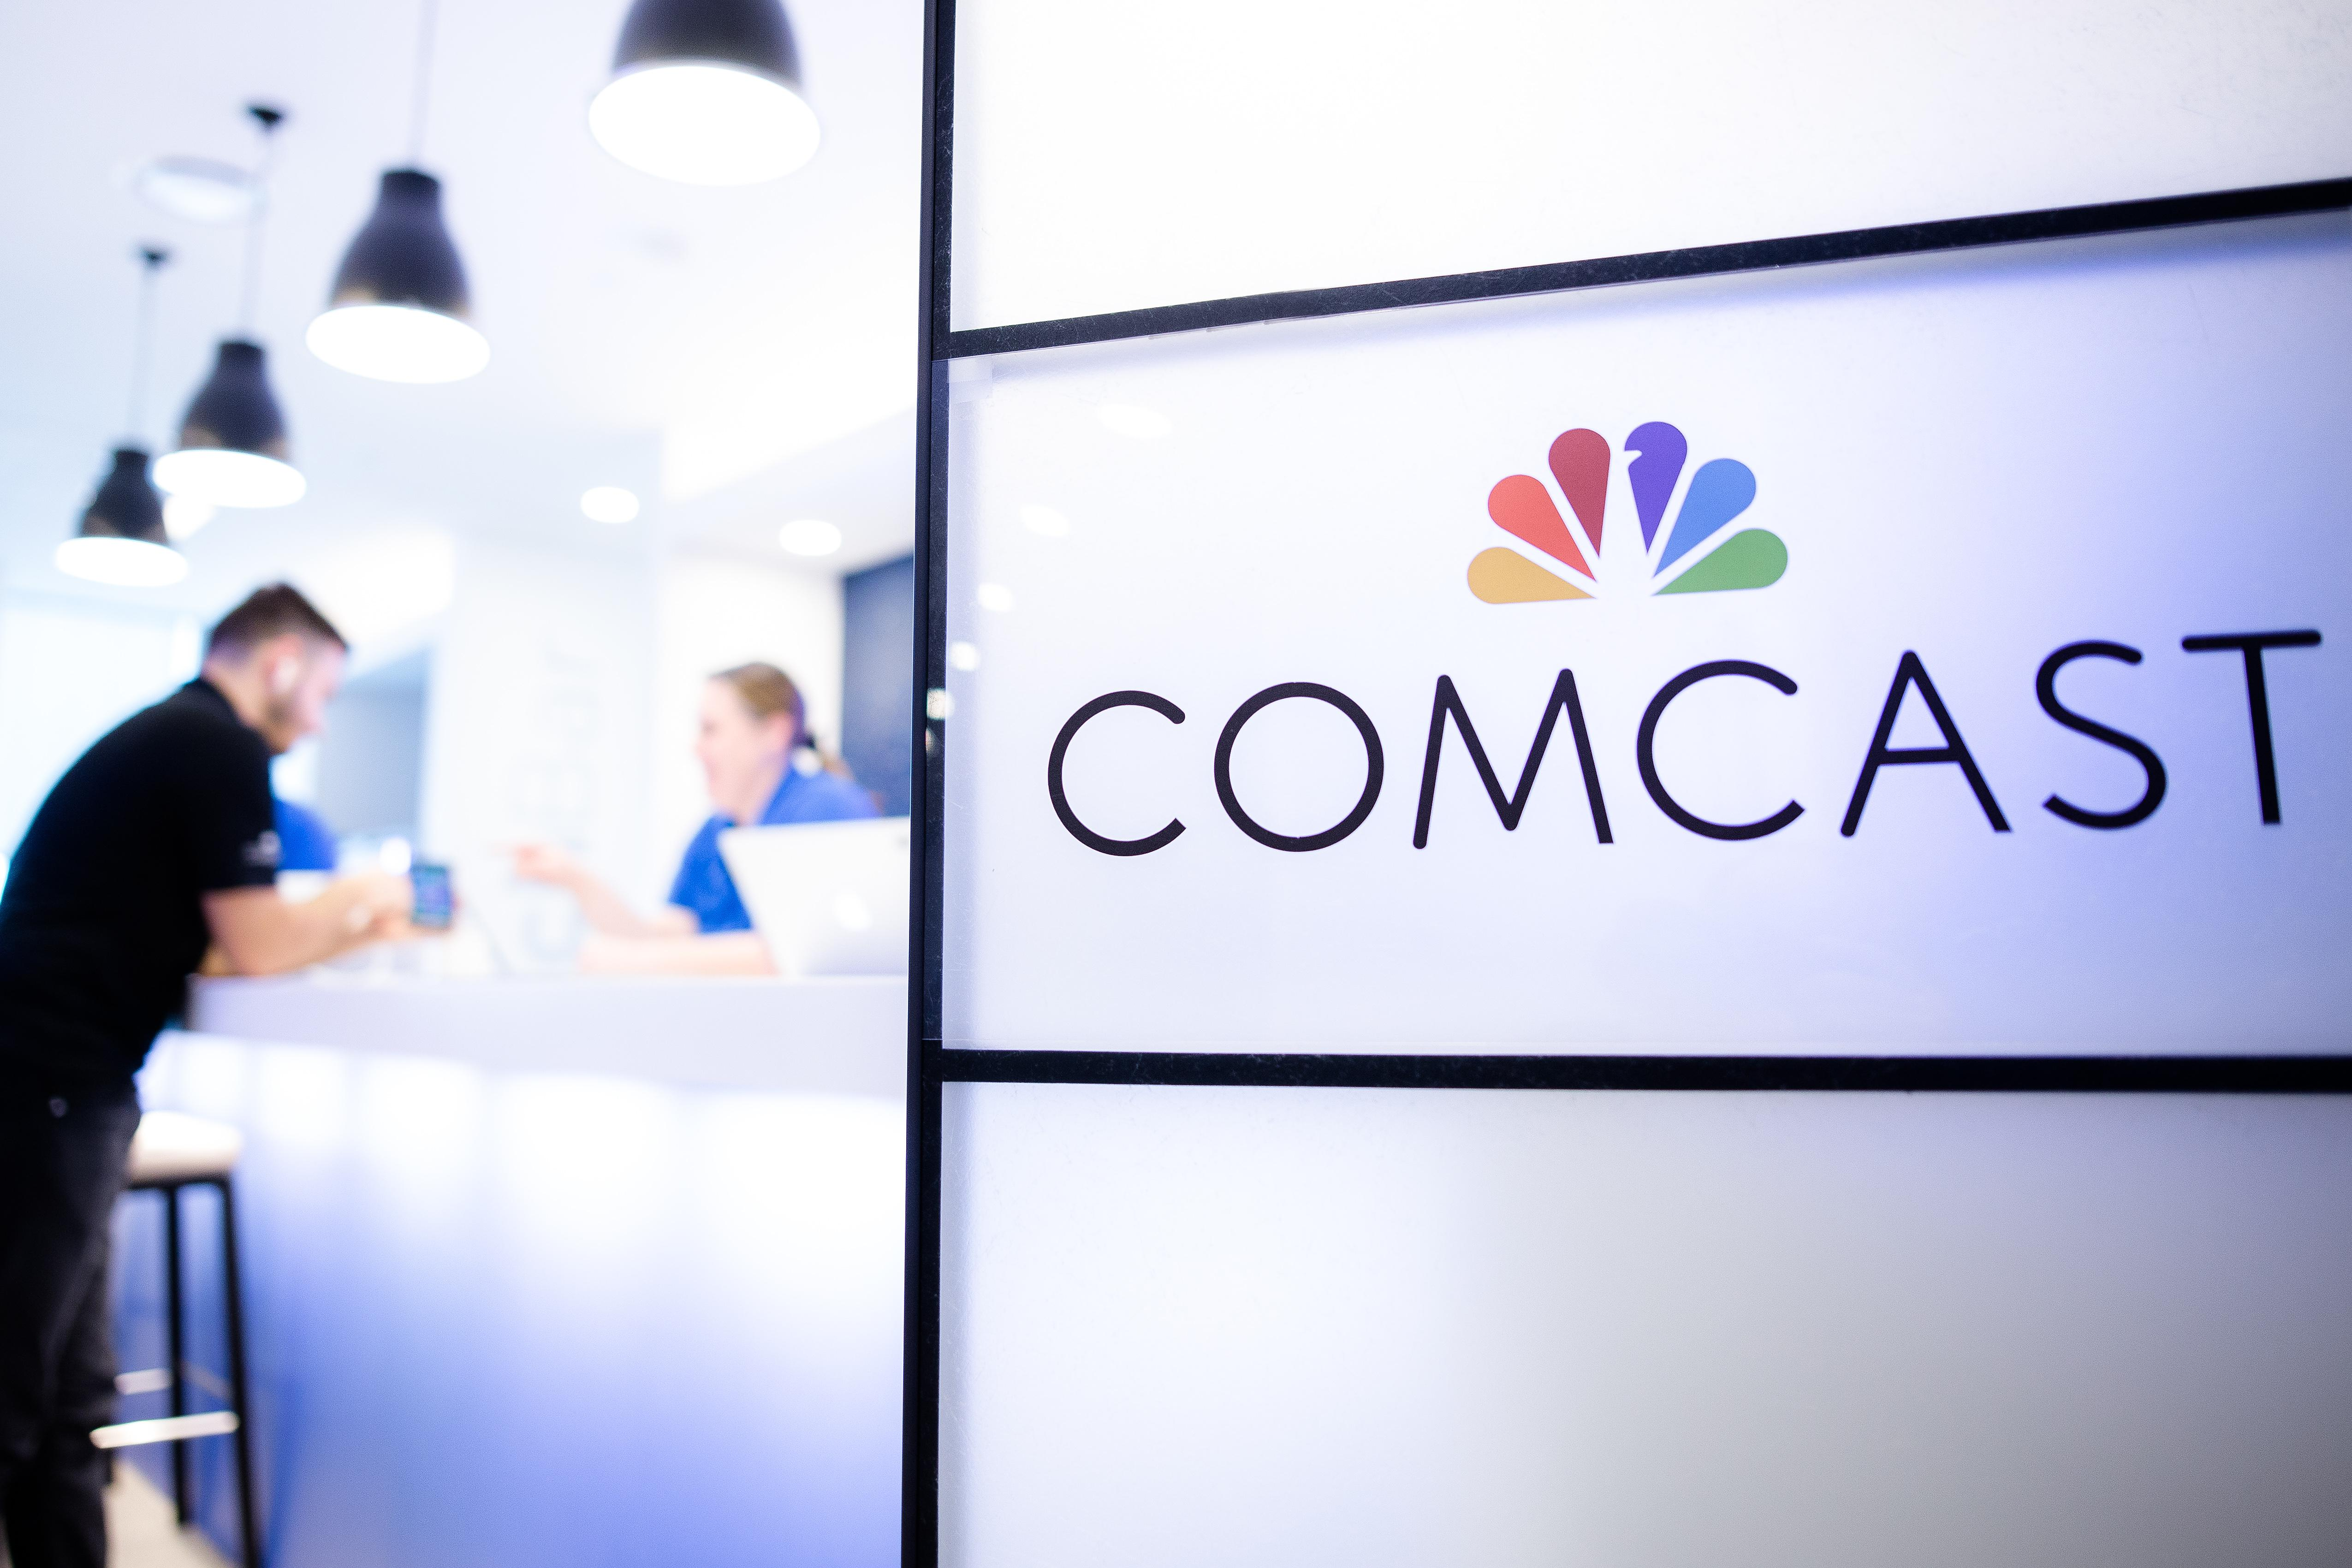 Comcast Xfinity TV app hits Spokane region, but don't toss your